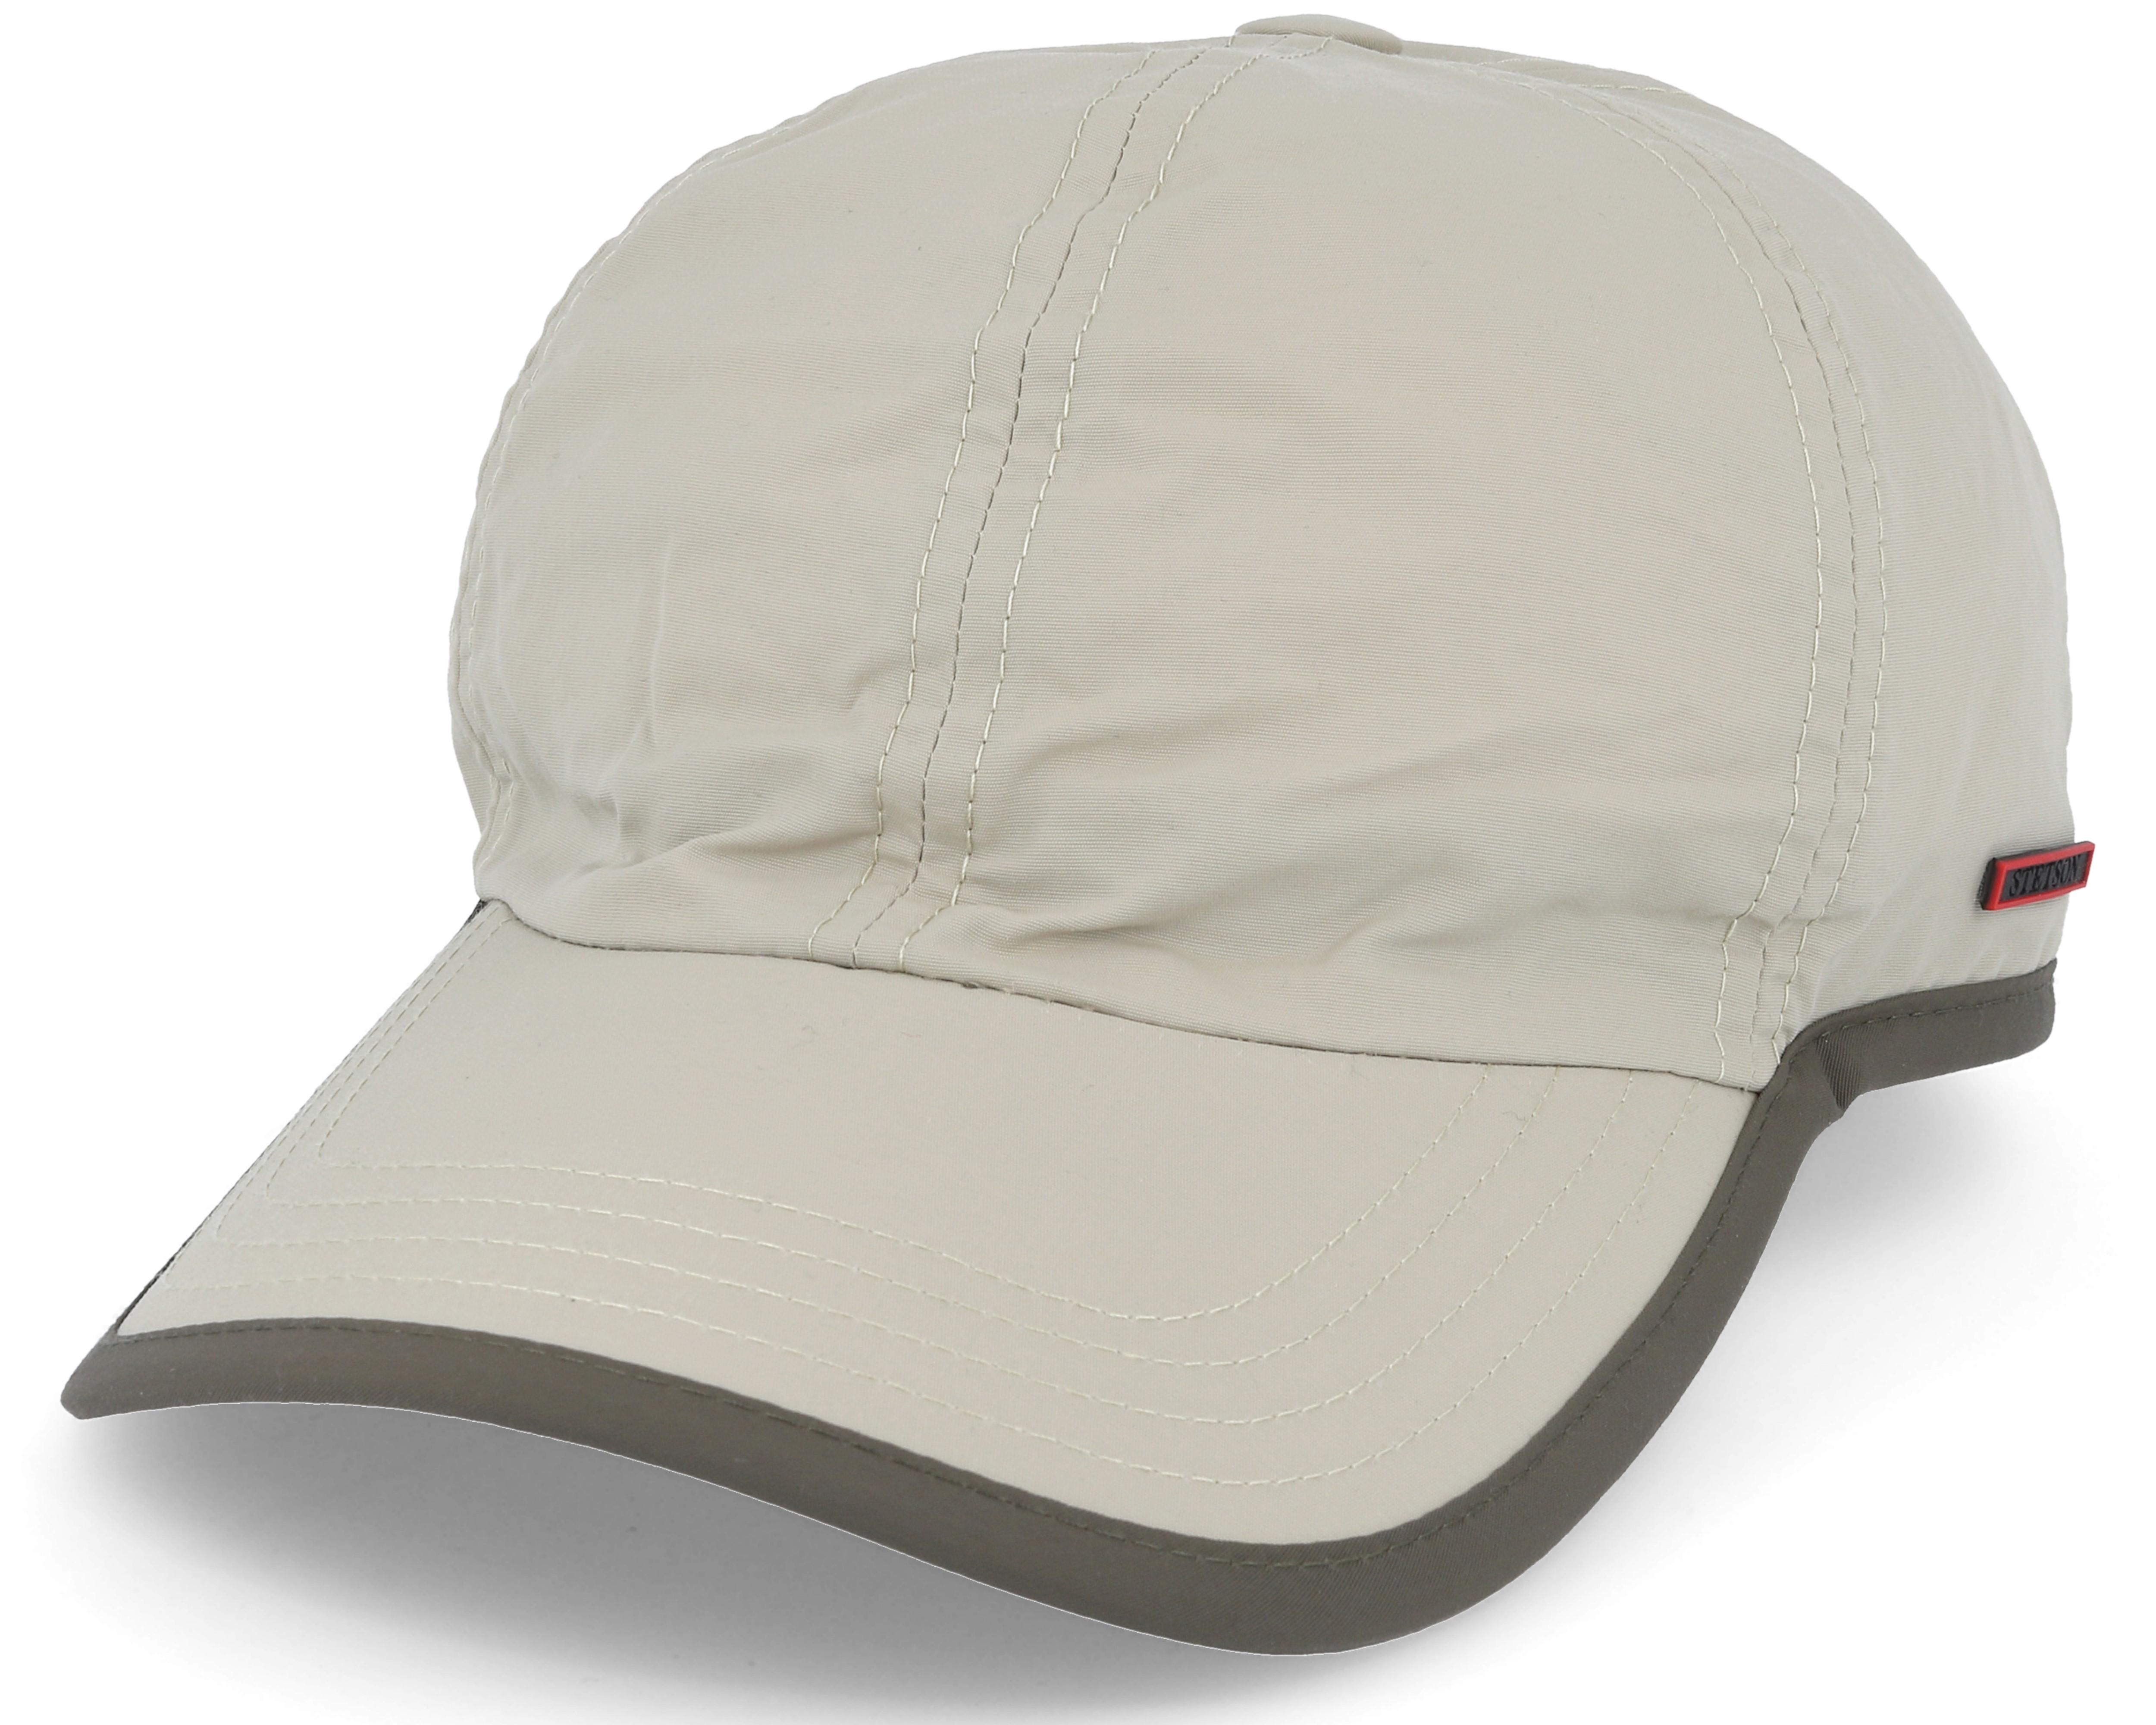 Baseball Cap Outdoor Beige Adjustable - Stetson caps  33ea44571d7